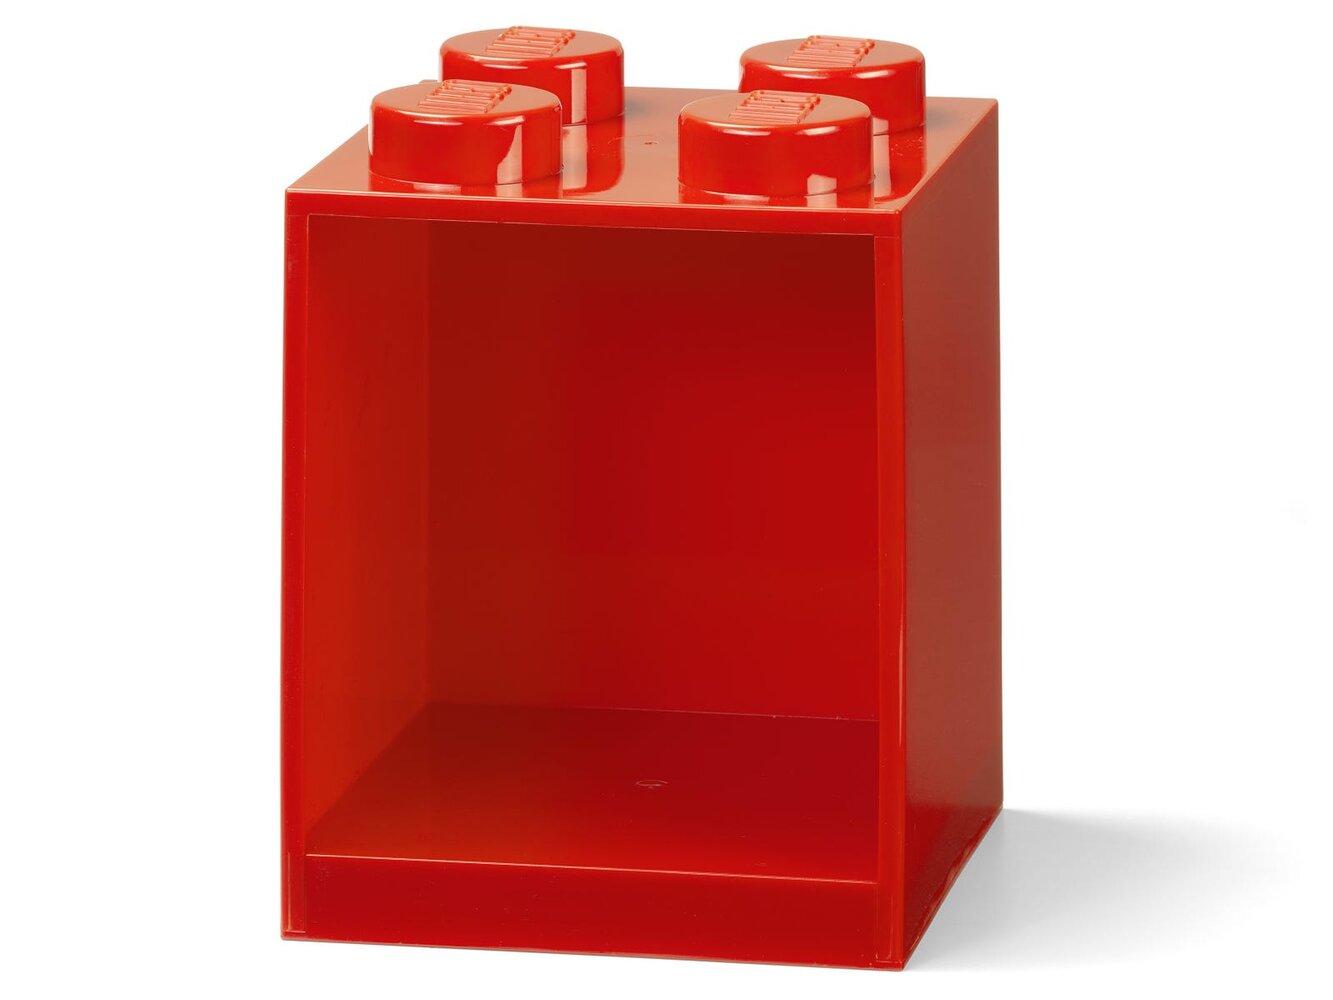 Brick Shelf 4 Knobs (Bright Red)